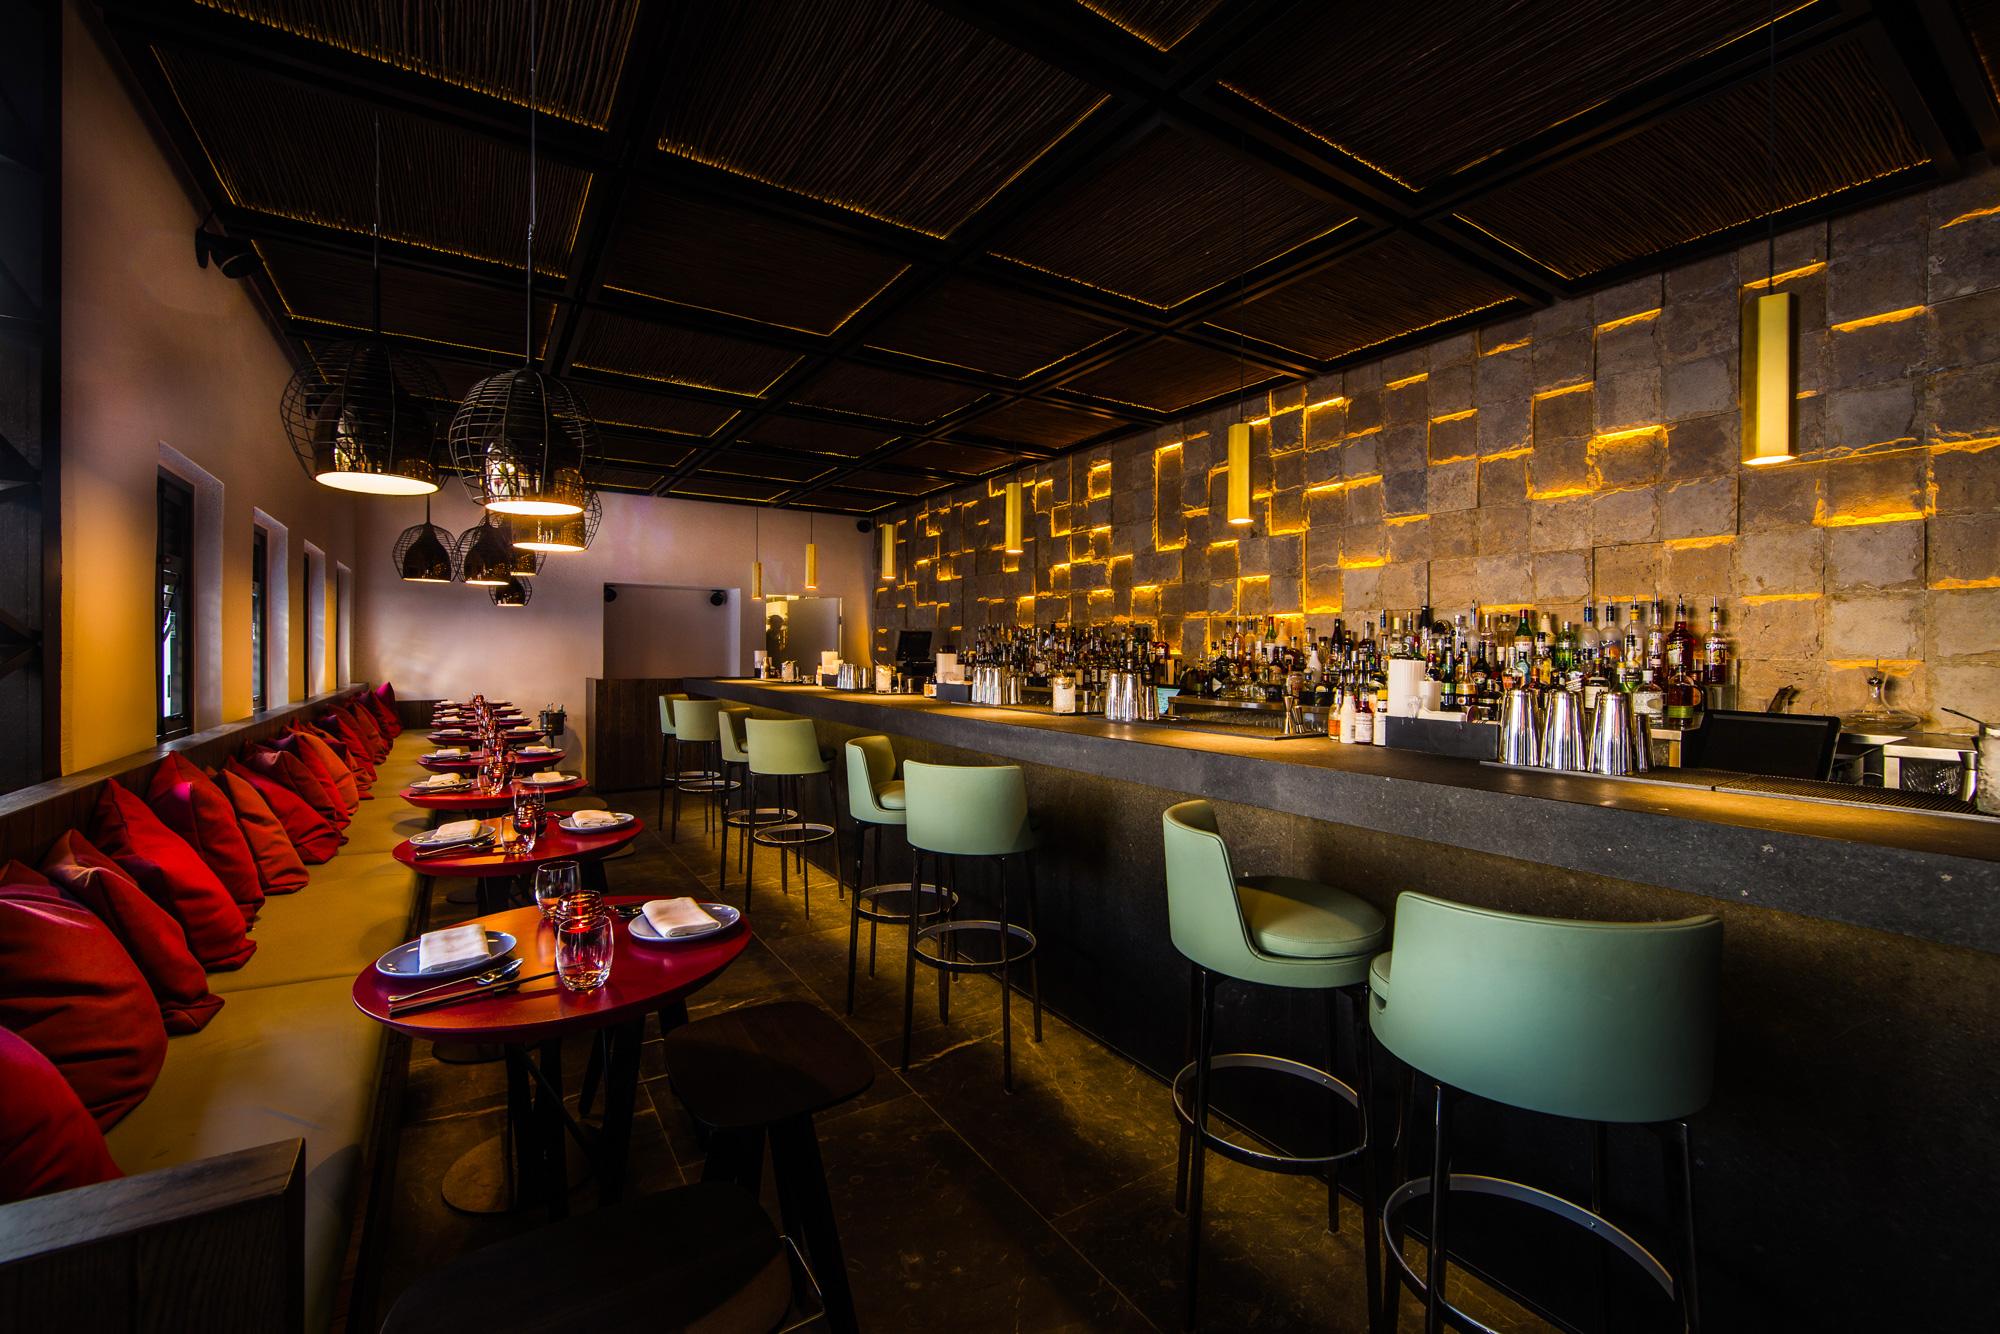 The bar at Ling Ling Mykonos